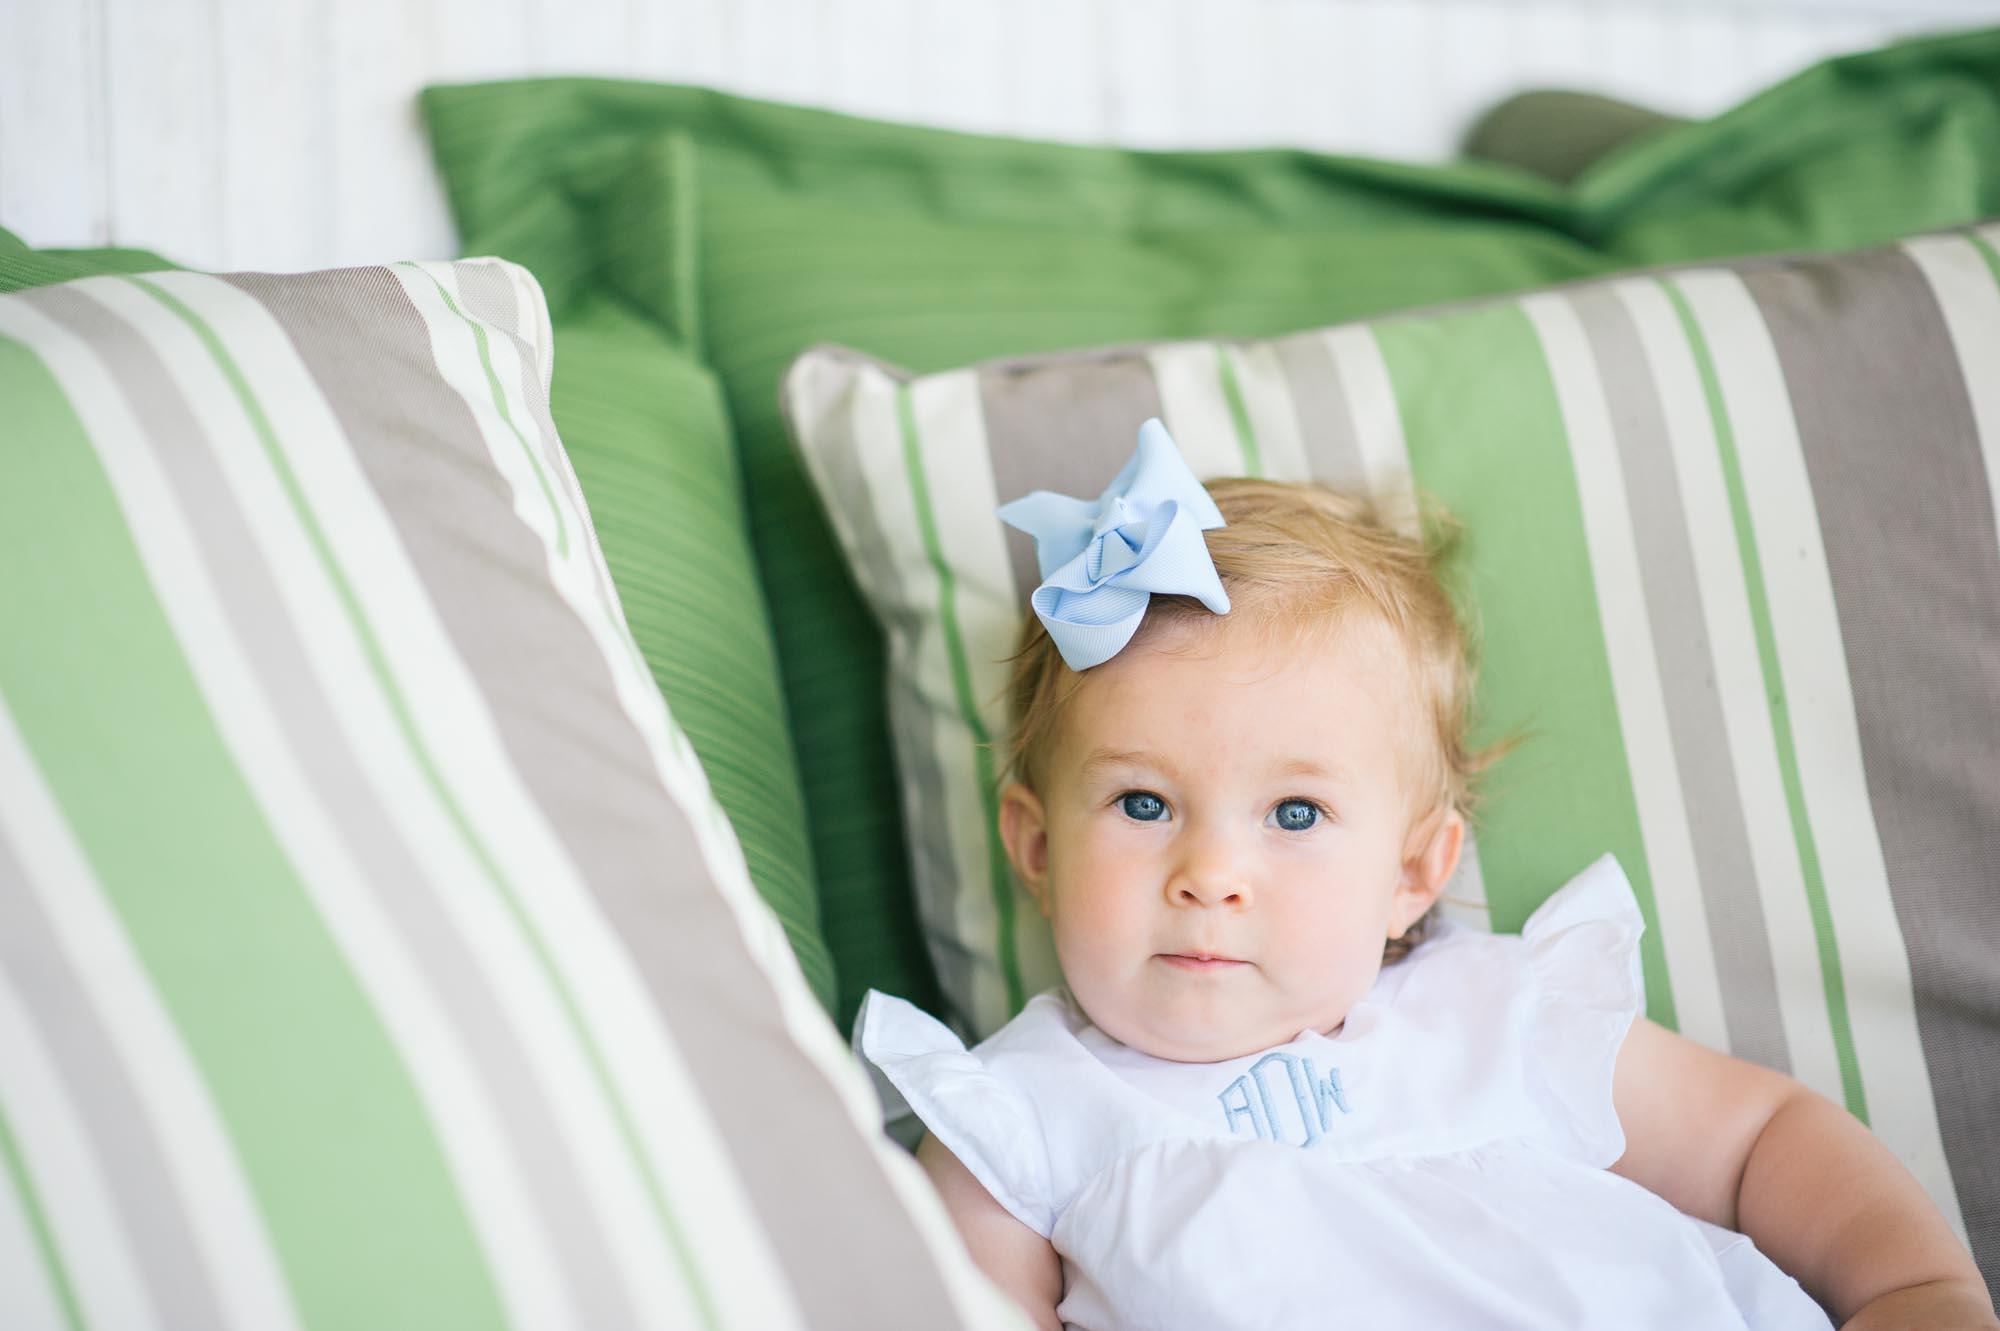 m.newsom-photography-one-year-old-girls-birthday-party-ideas-alice-in-wonderland (25 of 42).jpg